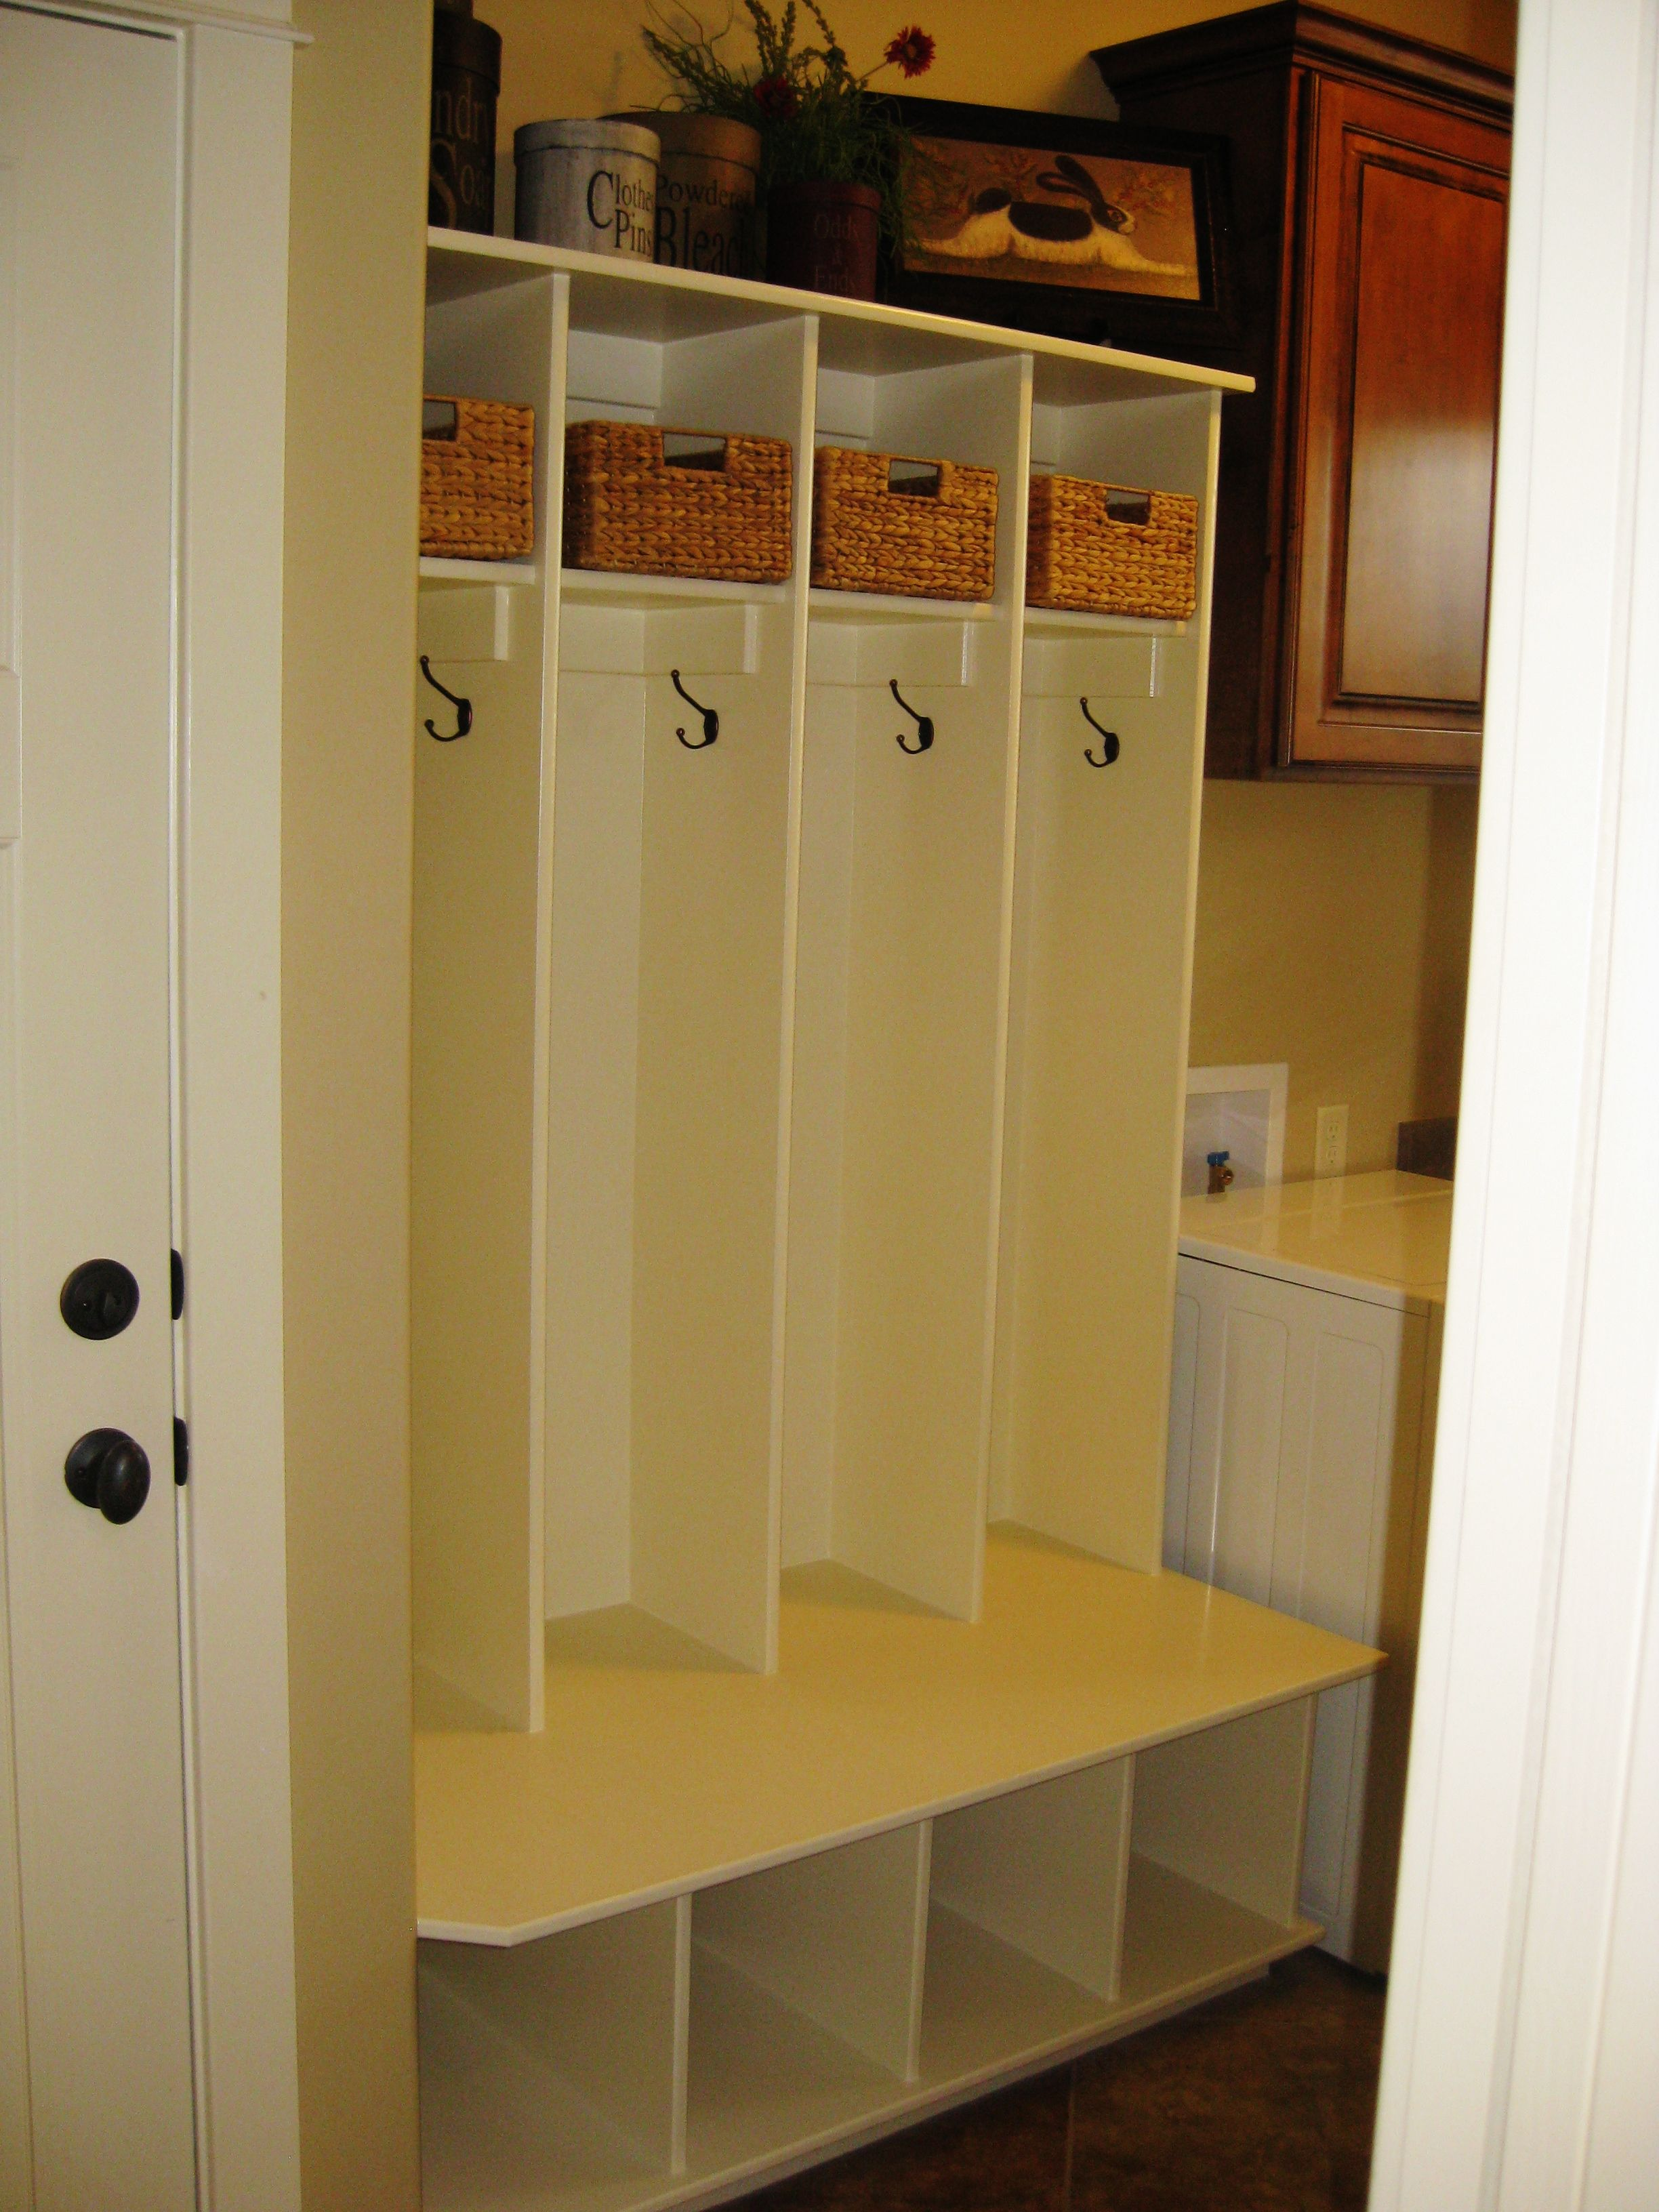 Locker Bedroom Furniture Locker Bedroom Furniture Listed Locker Bedroom Furniture Listed